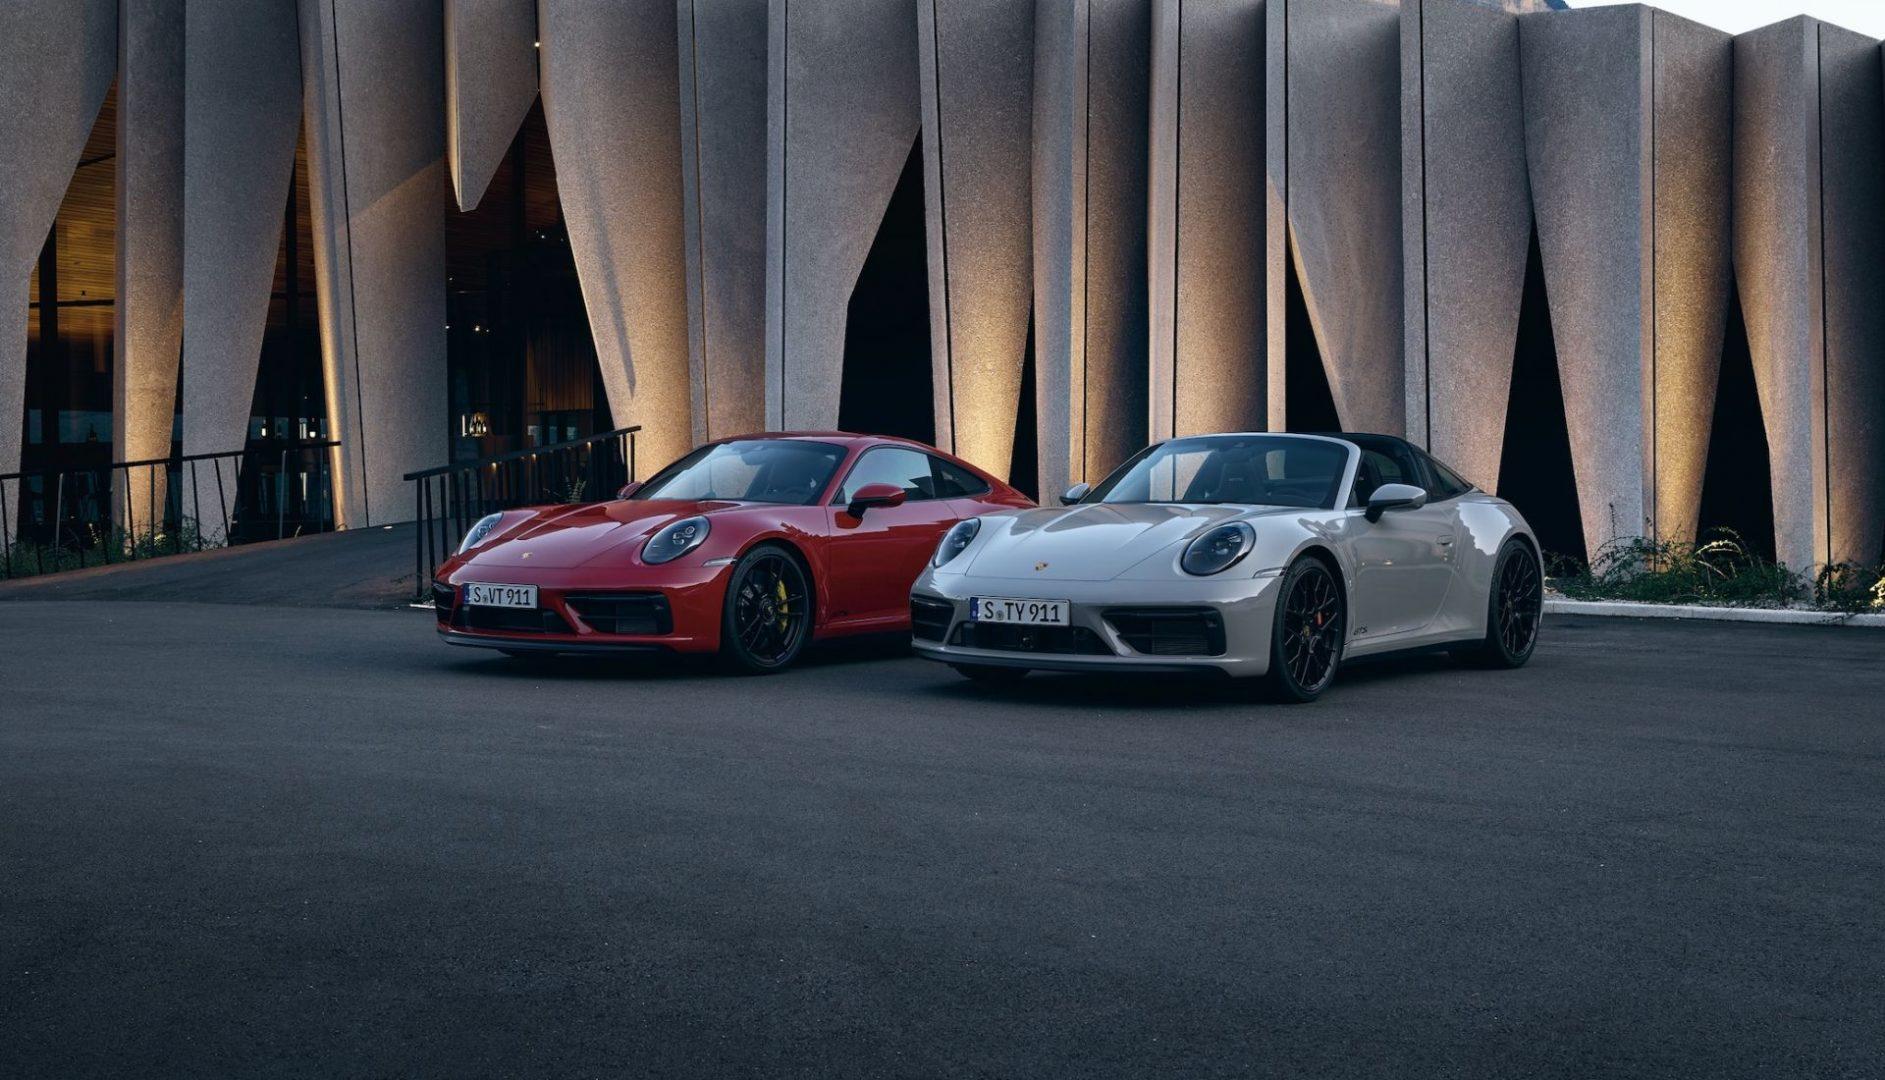 Uskoro stiže i novi Porsche 911 GTS